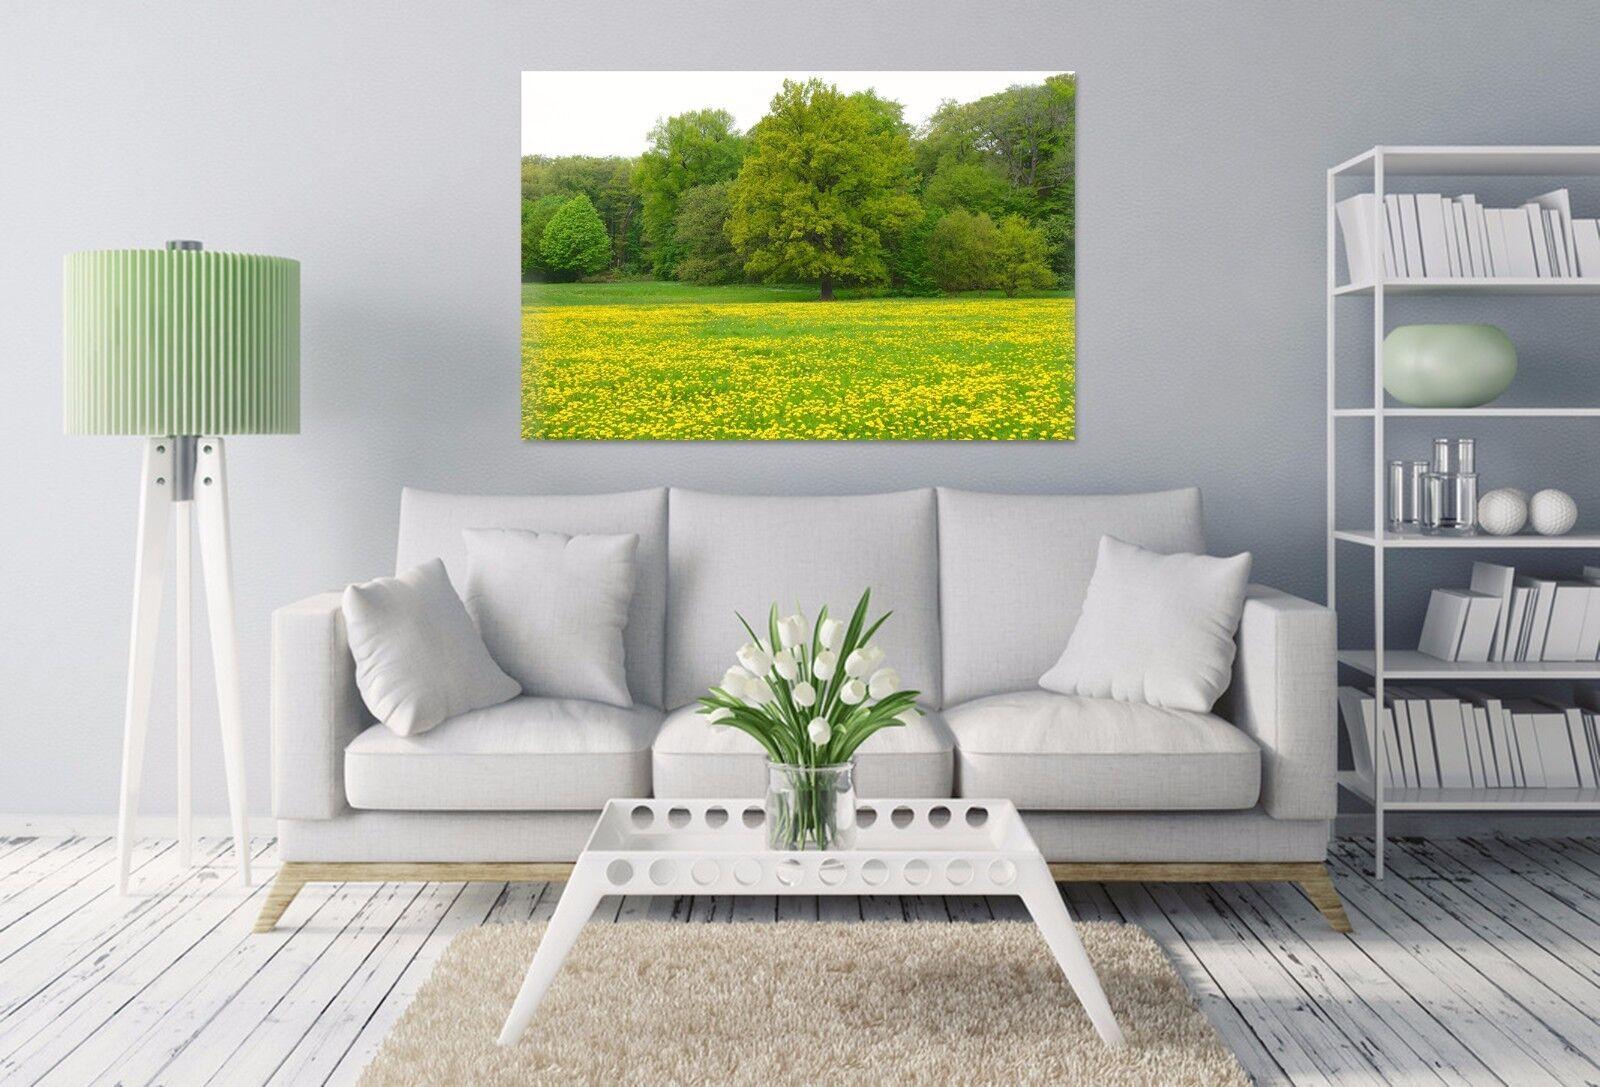 3D Gold Canola Blaume Baum  8564 Fototapeten Wandbild BildTapete AJSTORE DE Lemon